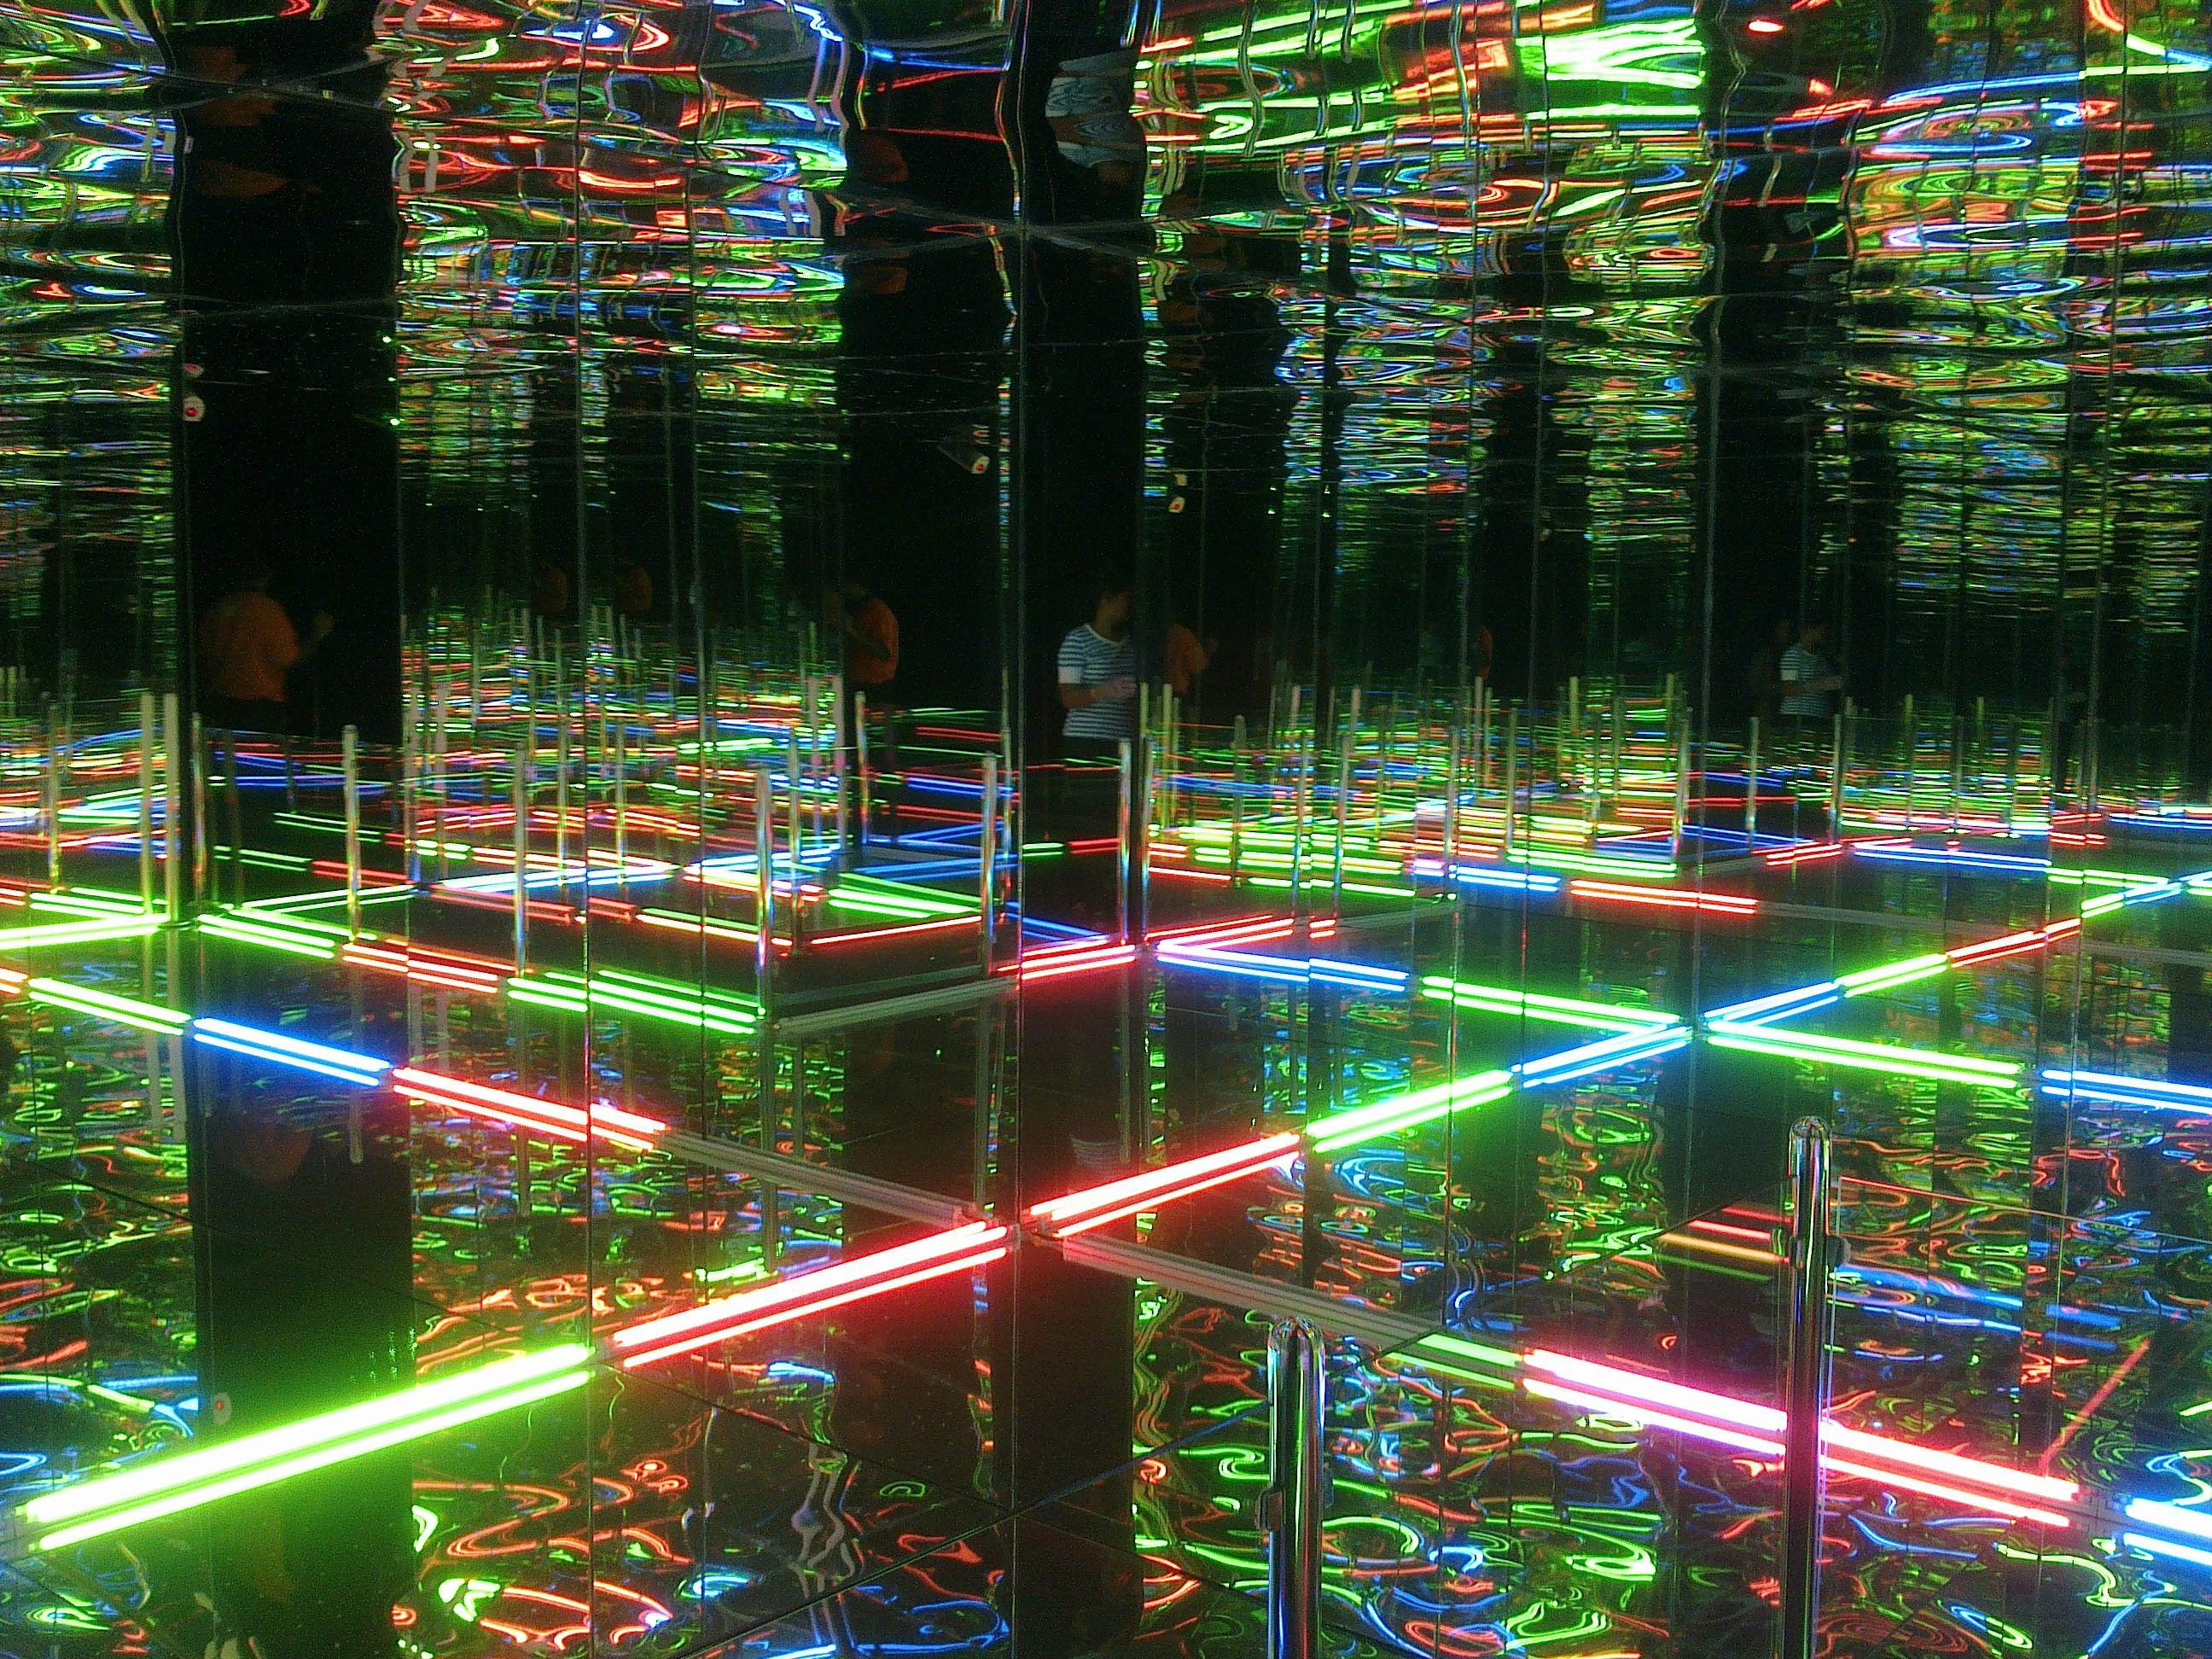 Incredible Image Inside The Mirror Maze At Prasadz Family